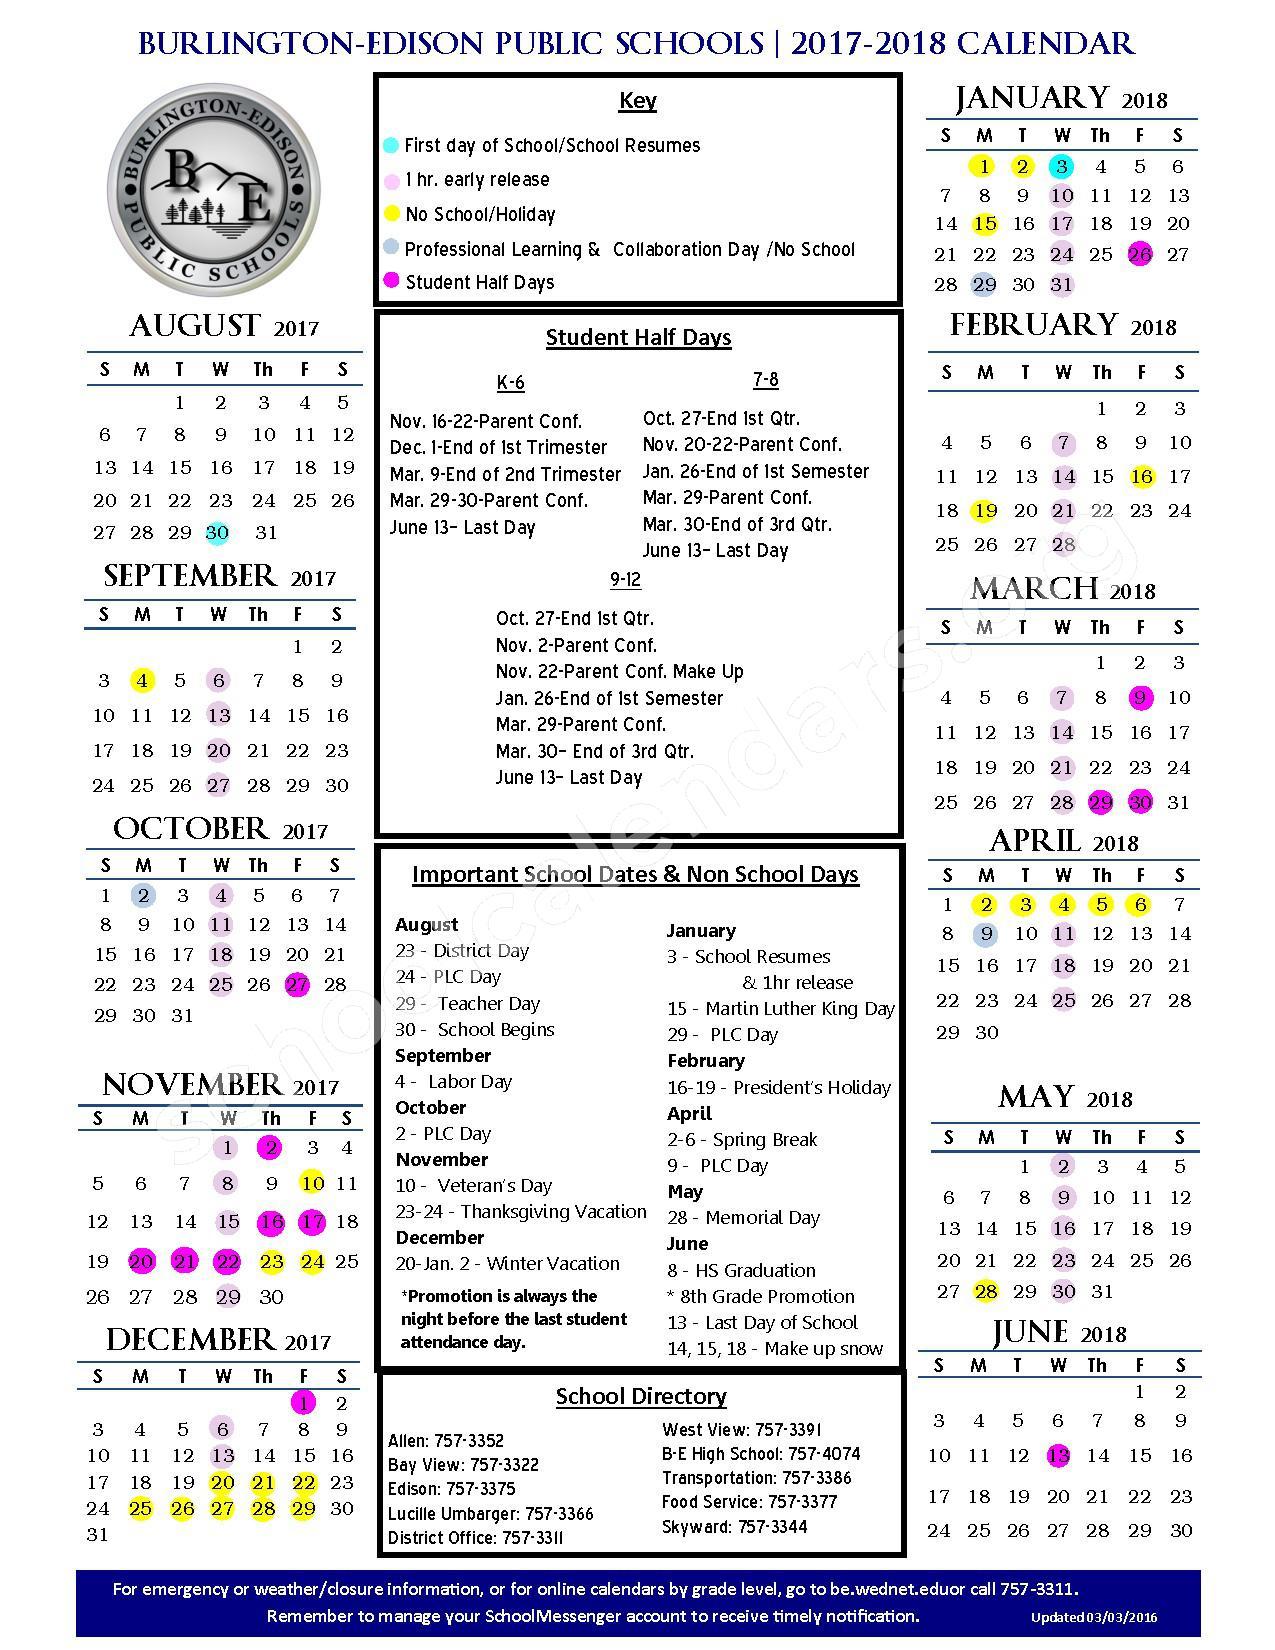 2017 - 2018 School Calendar – Burlington-Edison School District – page 1